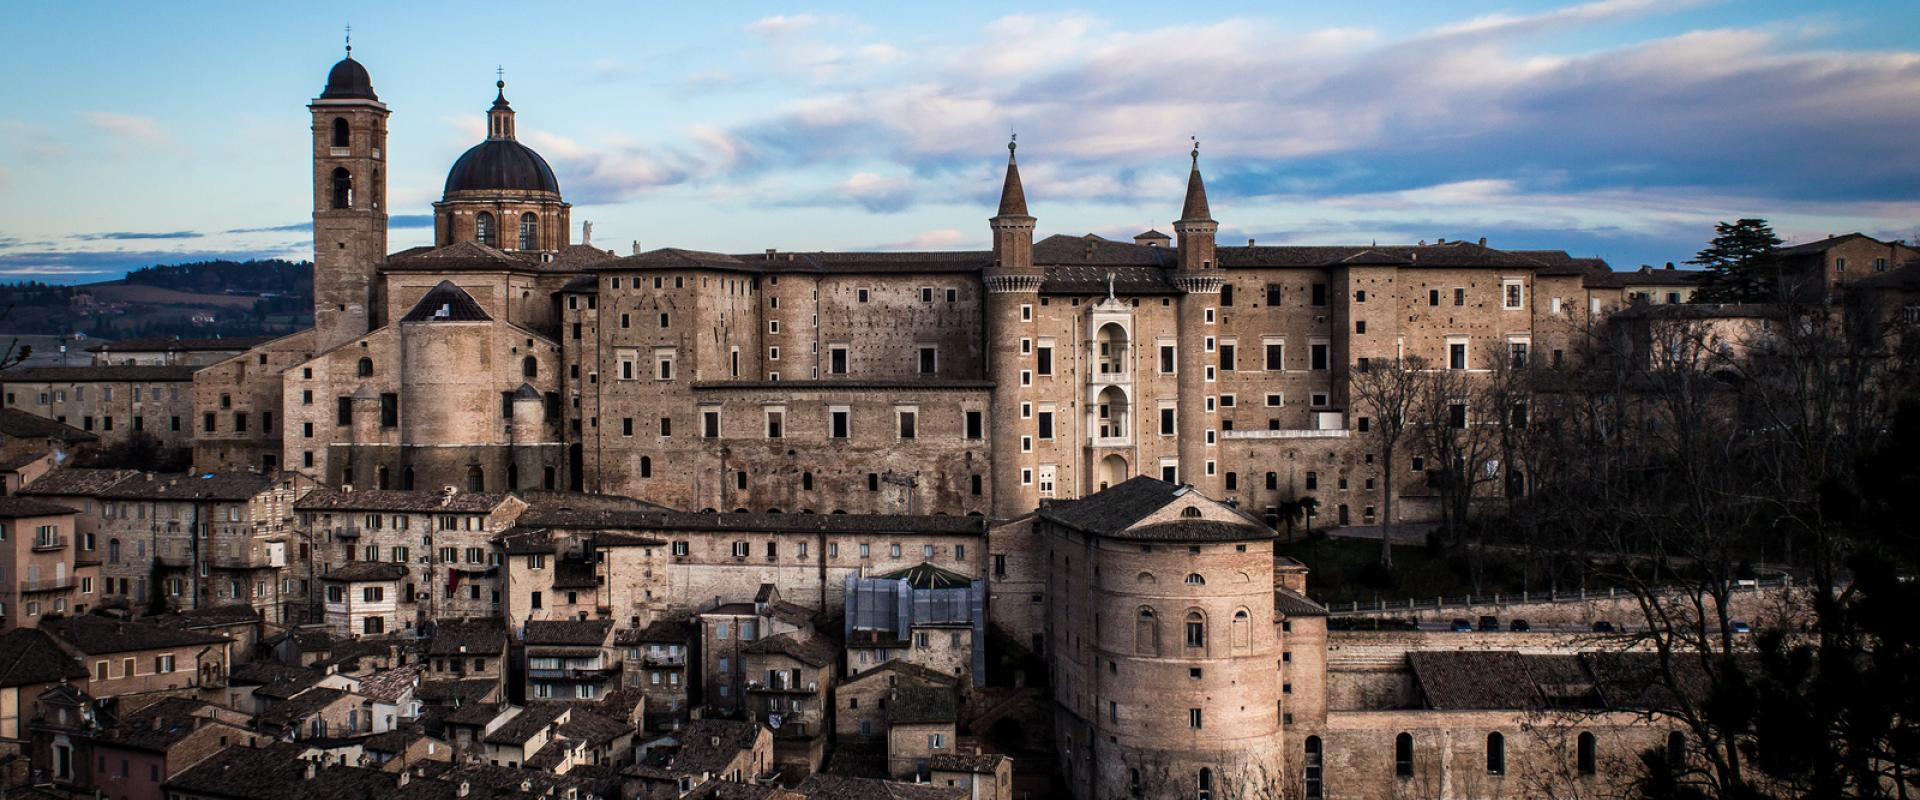 Visit of Urbino